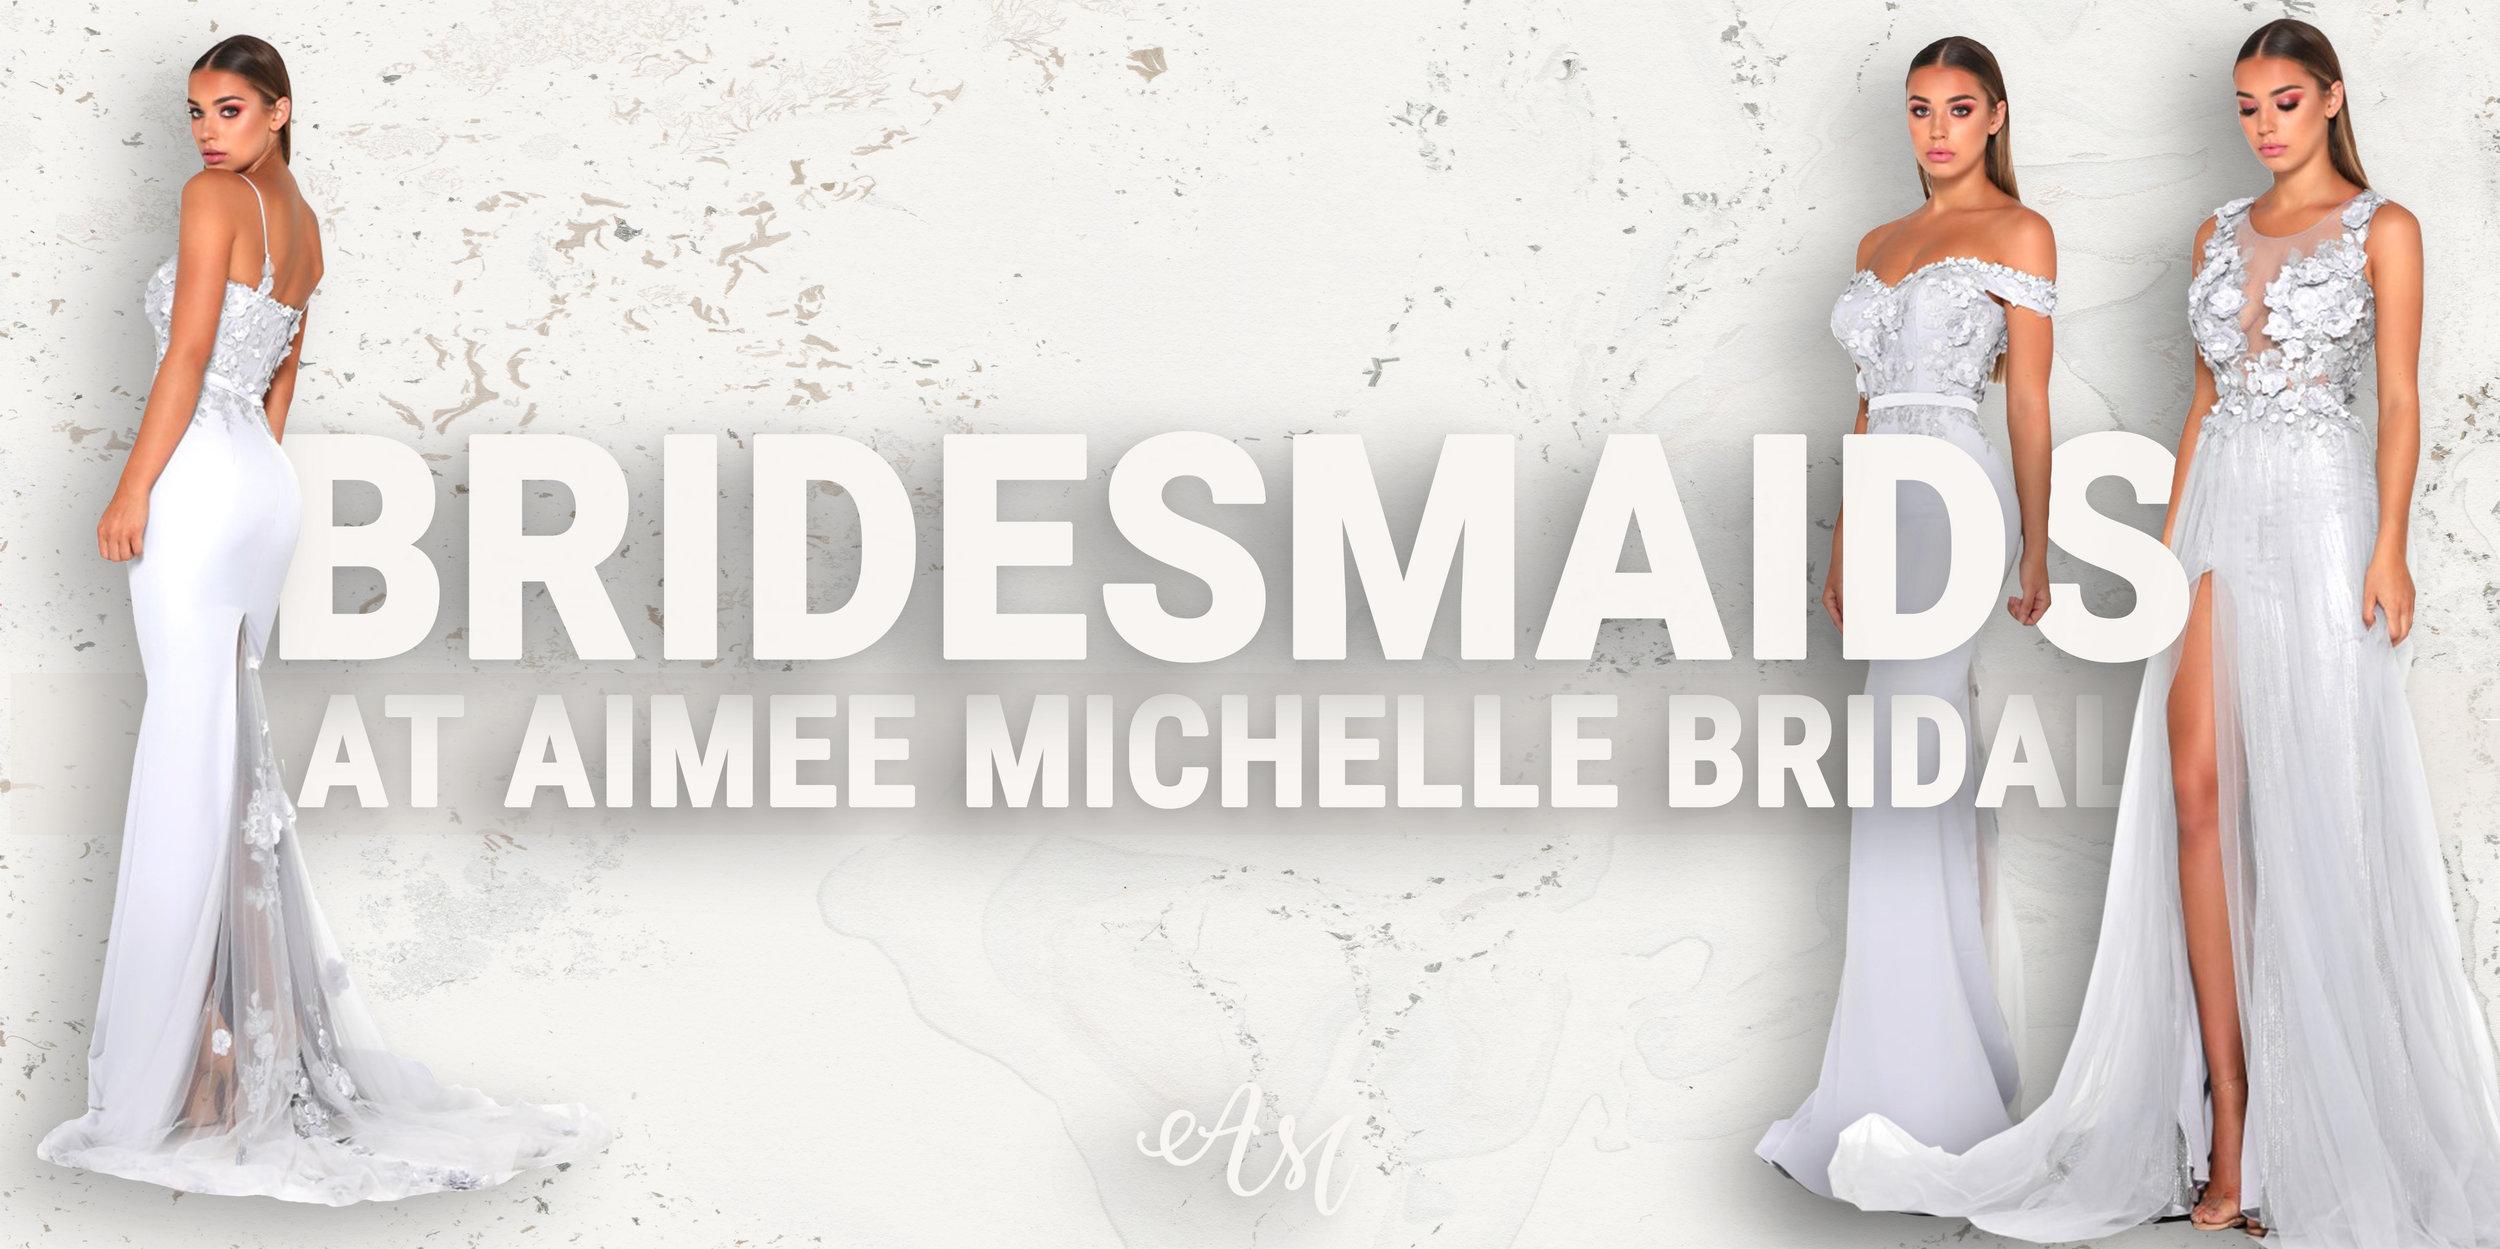 BridesmaidsBanner.jpg